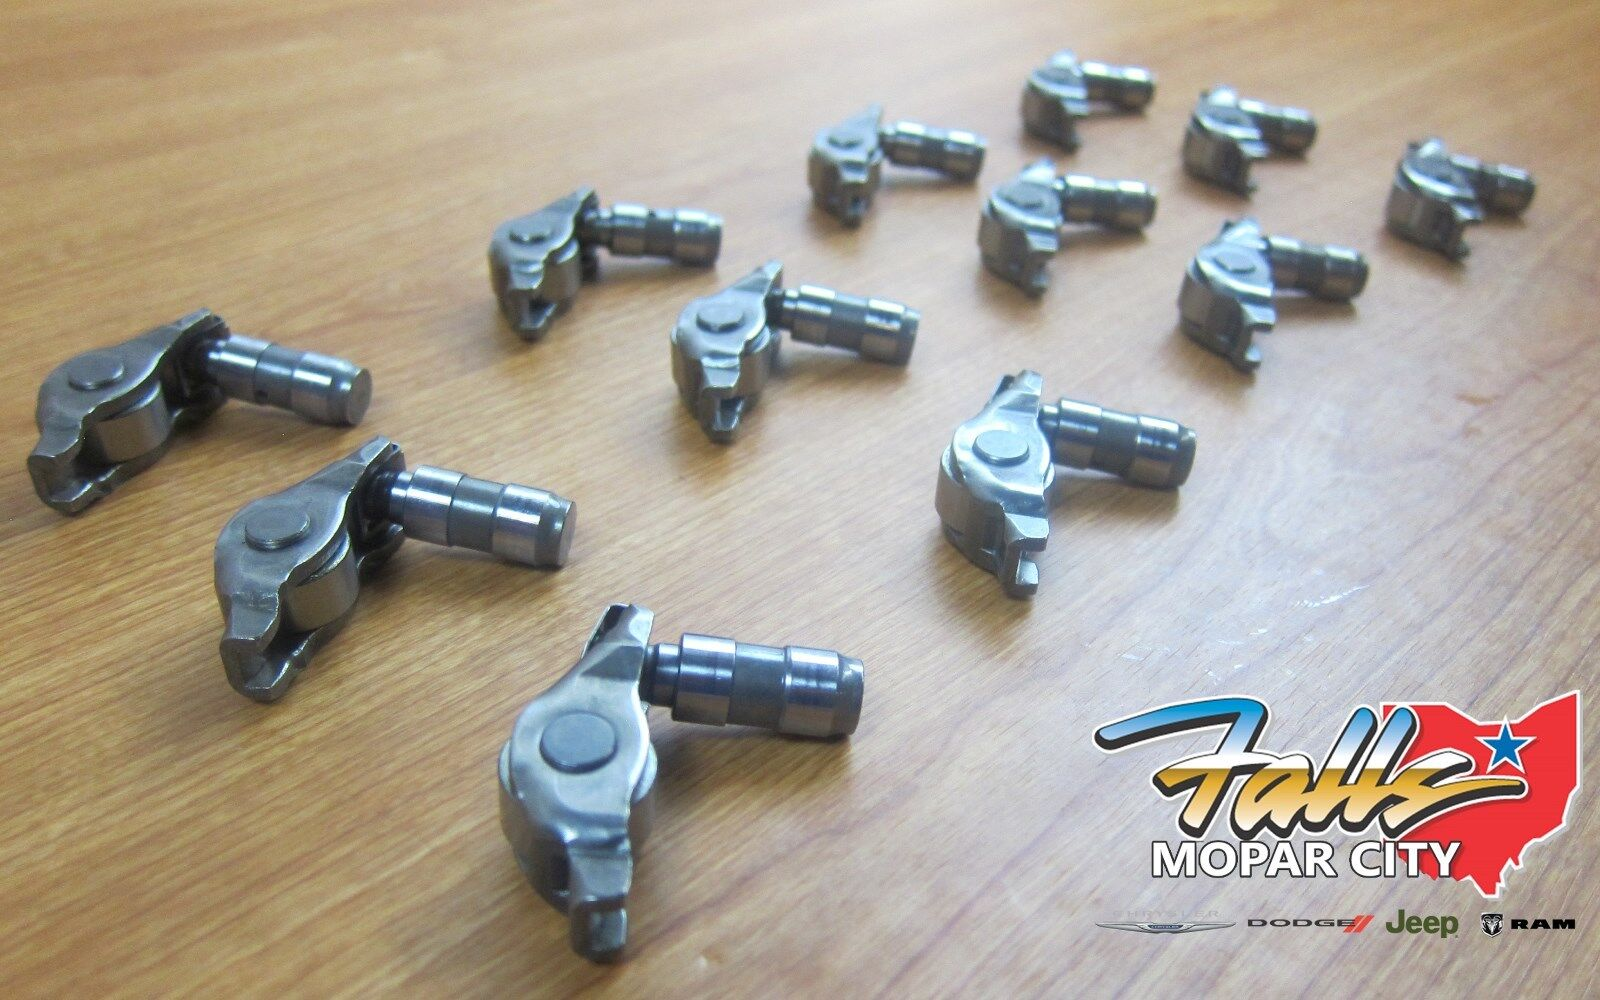 16 2019 chrysler 3 6l exhaust valve rocker arms w lifter set of 12 mopar oem [ 1600 x 1000 Pixel ]